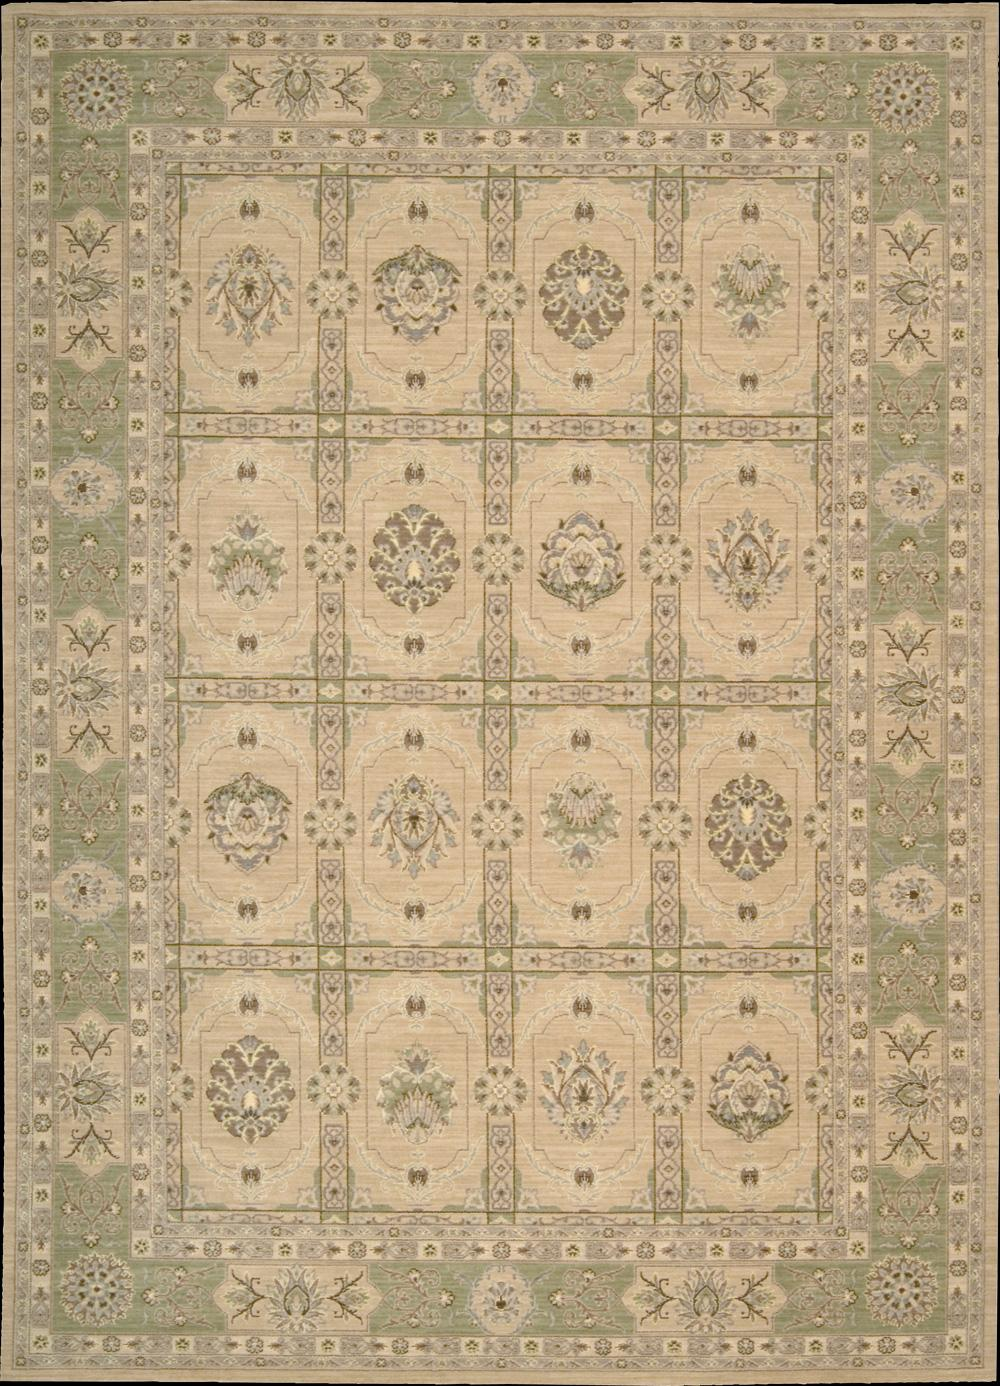 "Nourison Persian Empire Area Rug 9'6"" x 13' - Item Number: 25671"